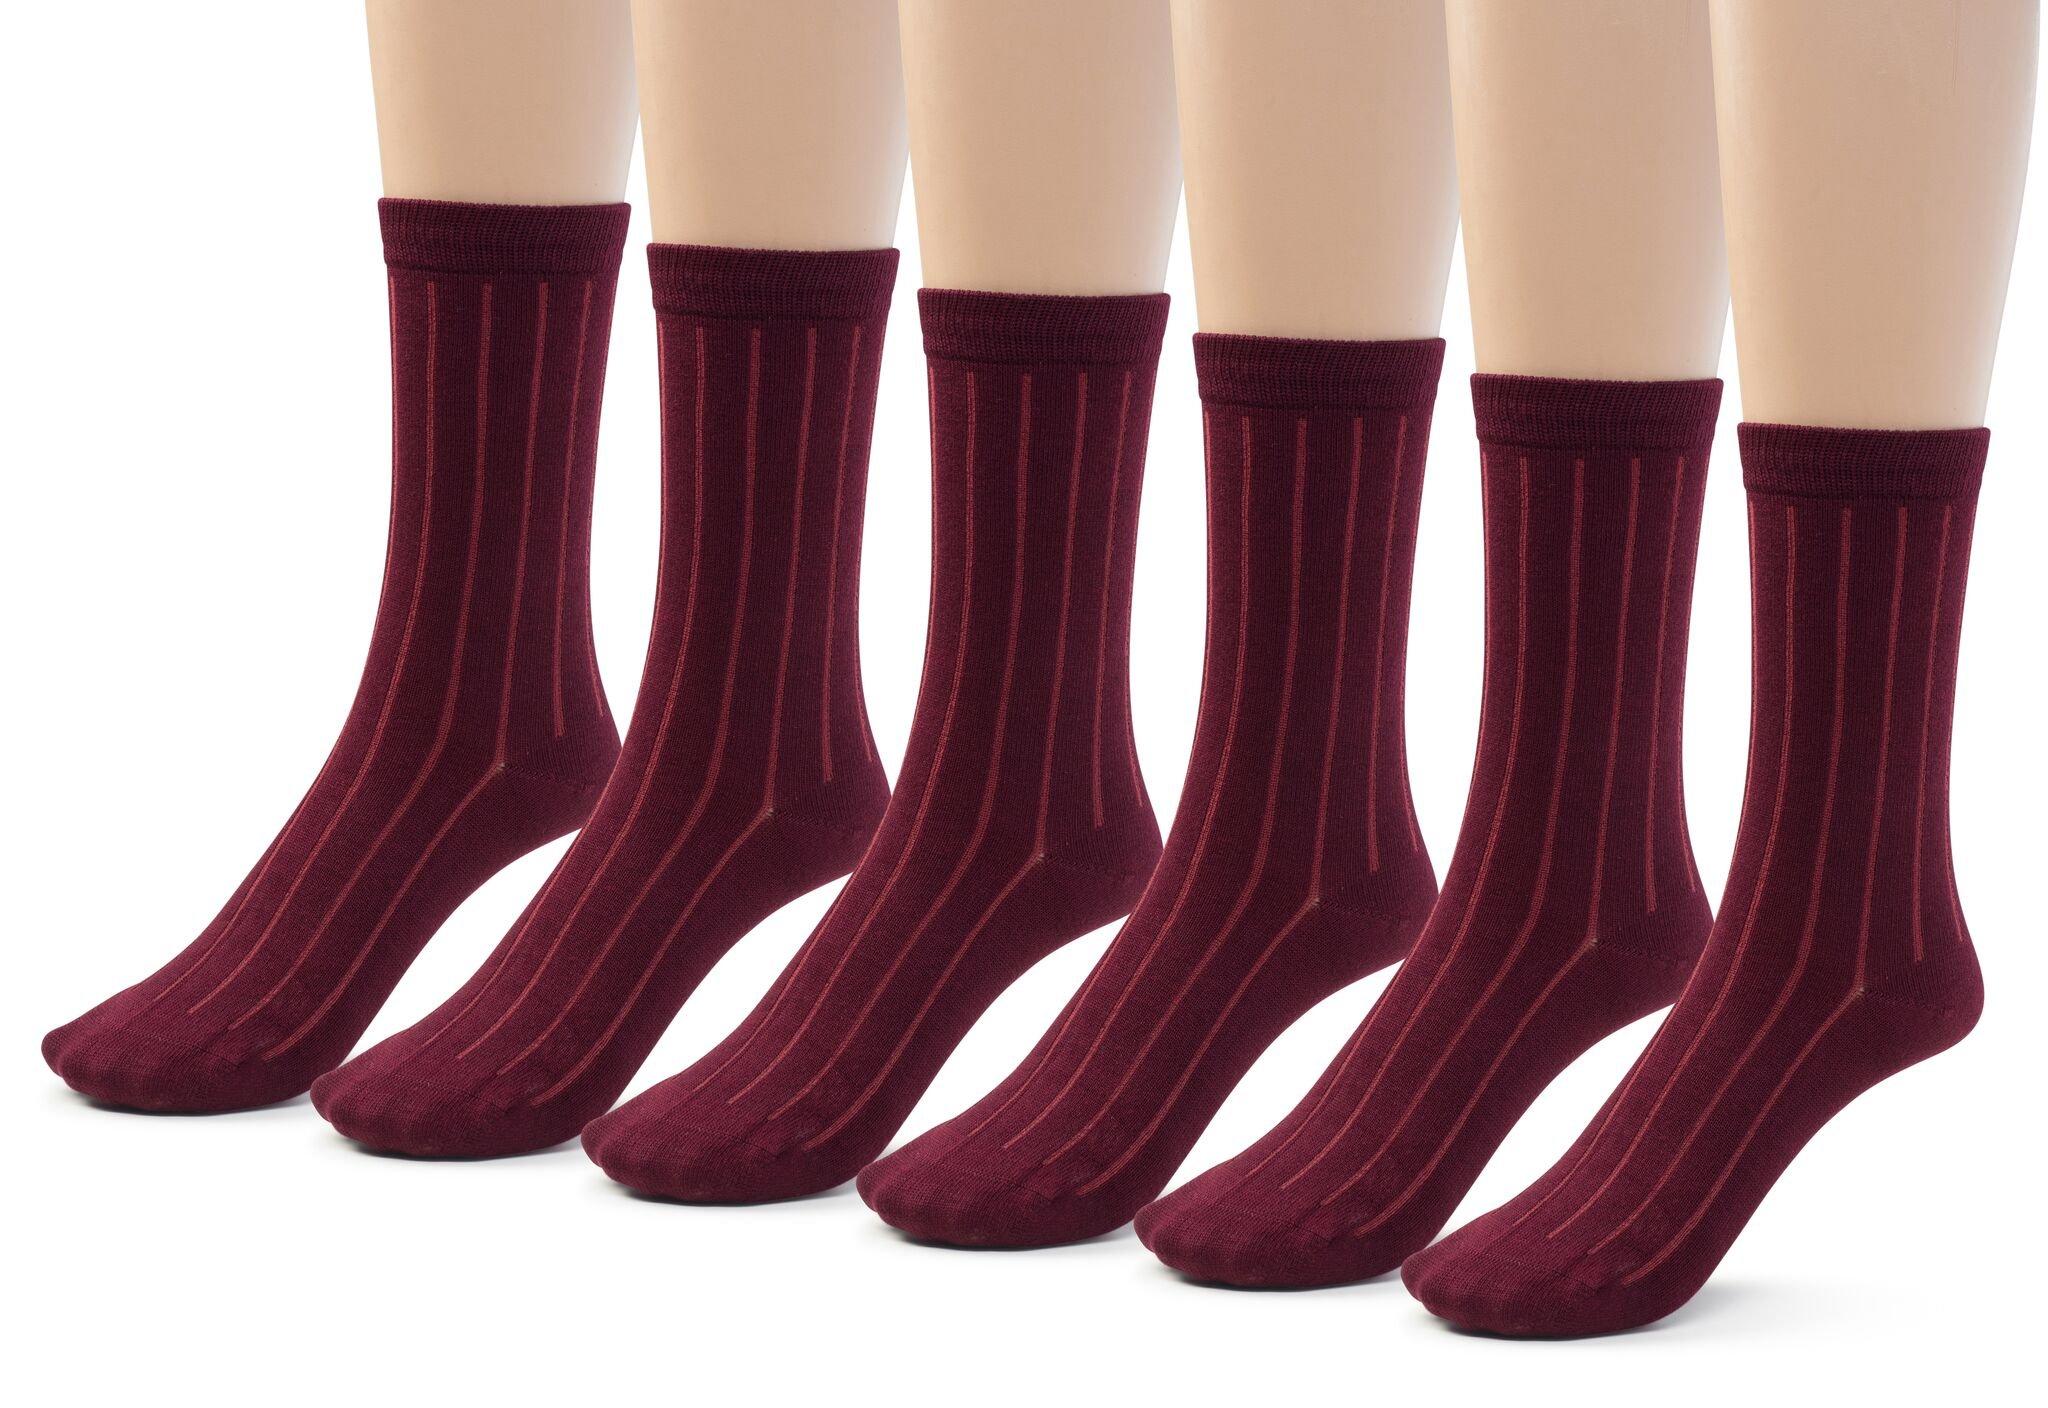 Silky Toes 6 Pk Bamboo Ribbed Boys Girls Crew Socks, Casual School Uniform Basic Socks (Large (9-11), Burgundy (6 Pack))